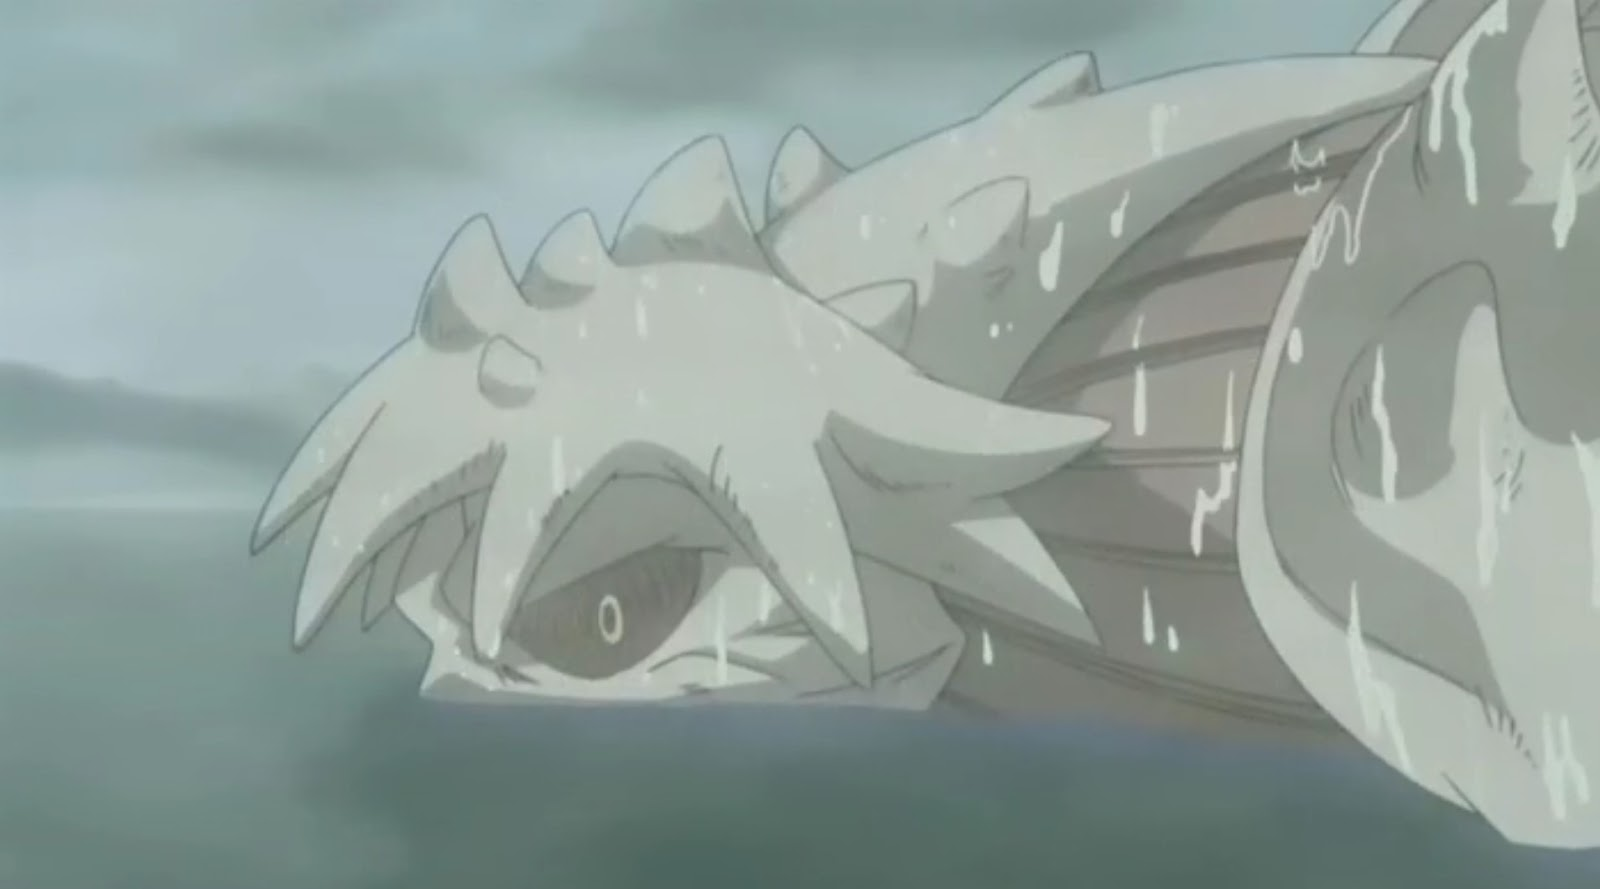 Assistir Naruto Shippuden Episódio 100, Assistir Naruto Shippuden Todos os Episódios Legendado, Naruto Shippuden episódio 100,HD